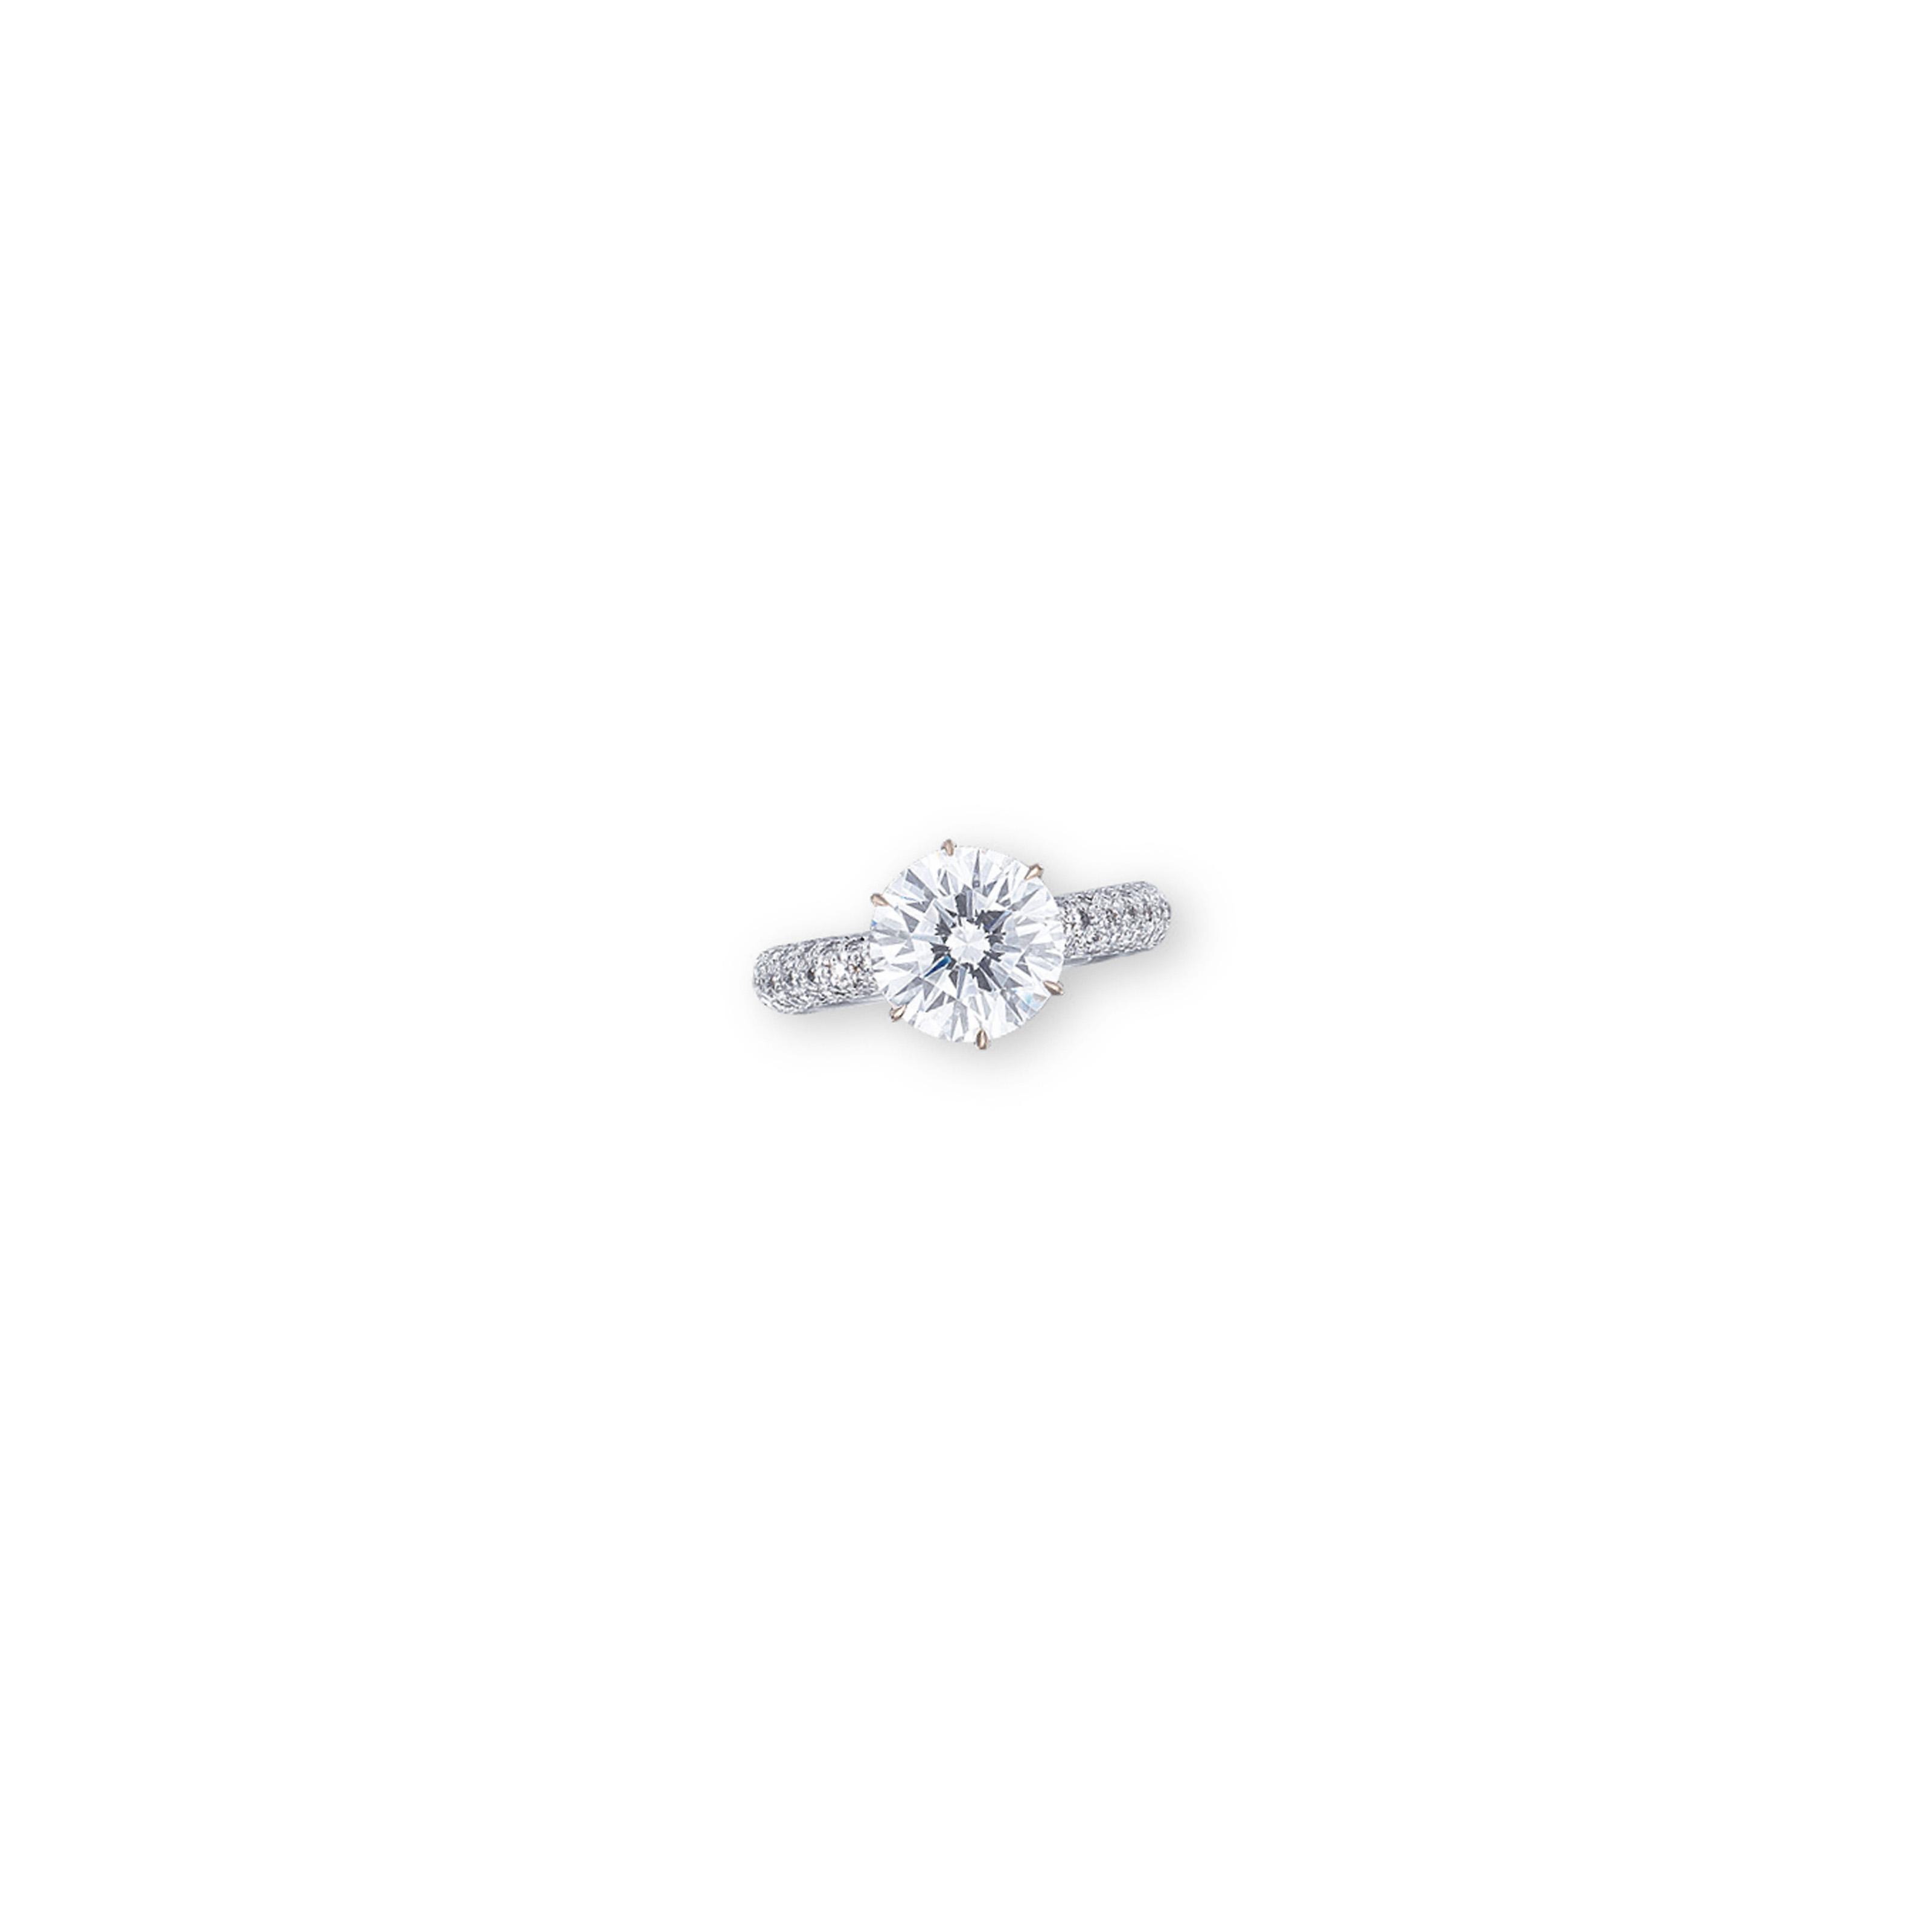 A DIAMOND RING, BY ADLER